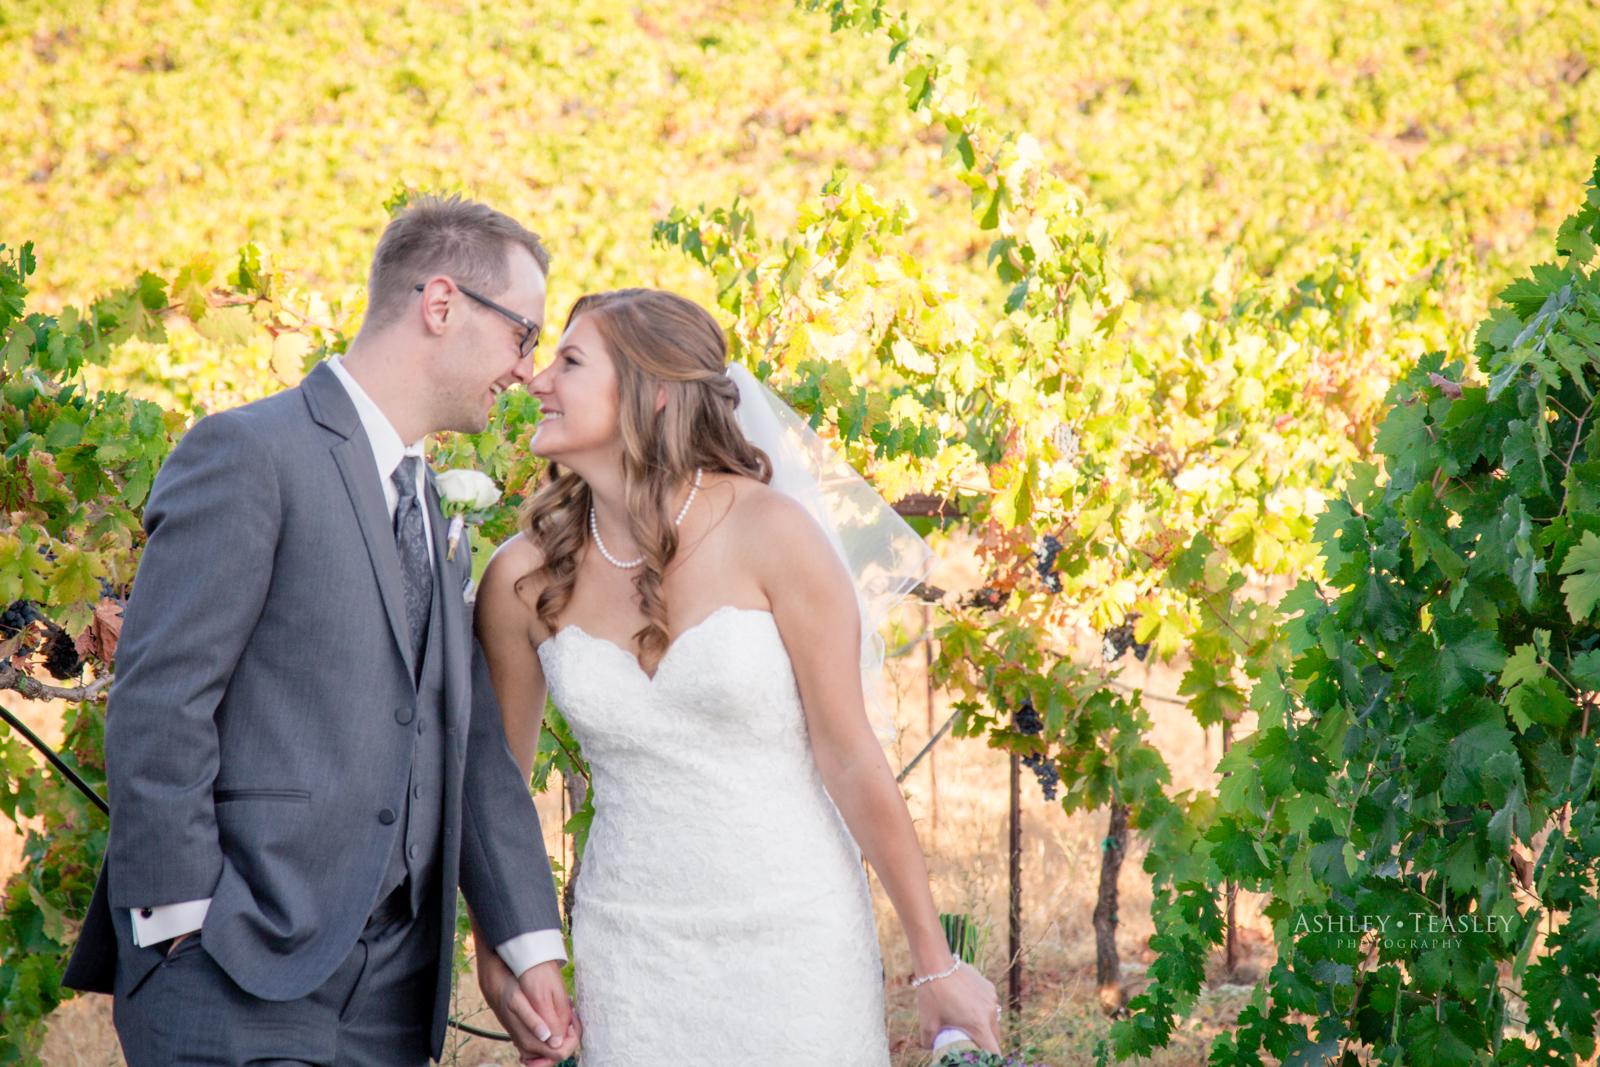 Ashley Teasley Photography - Amador Cellars Winery - Sacramento Wedding Photographer-131.JPG